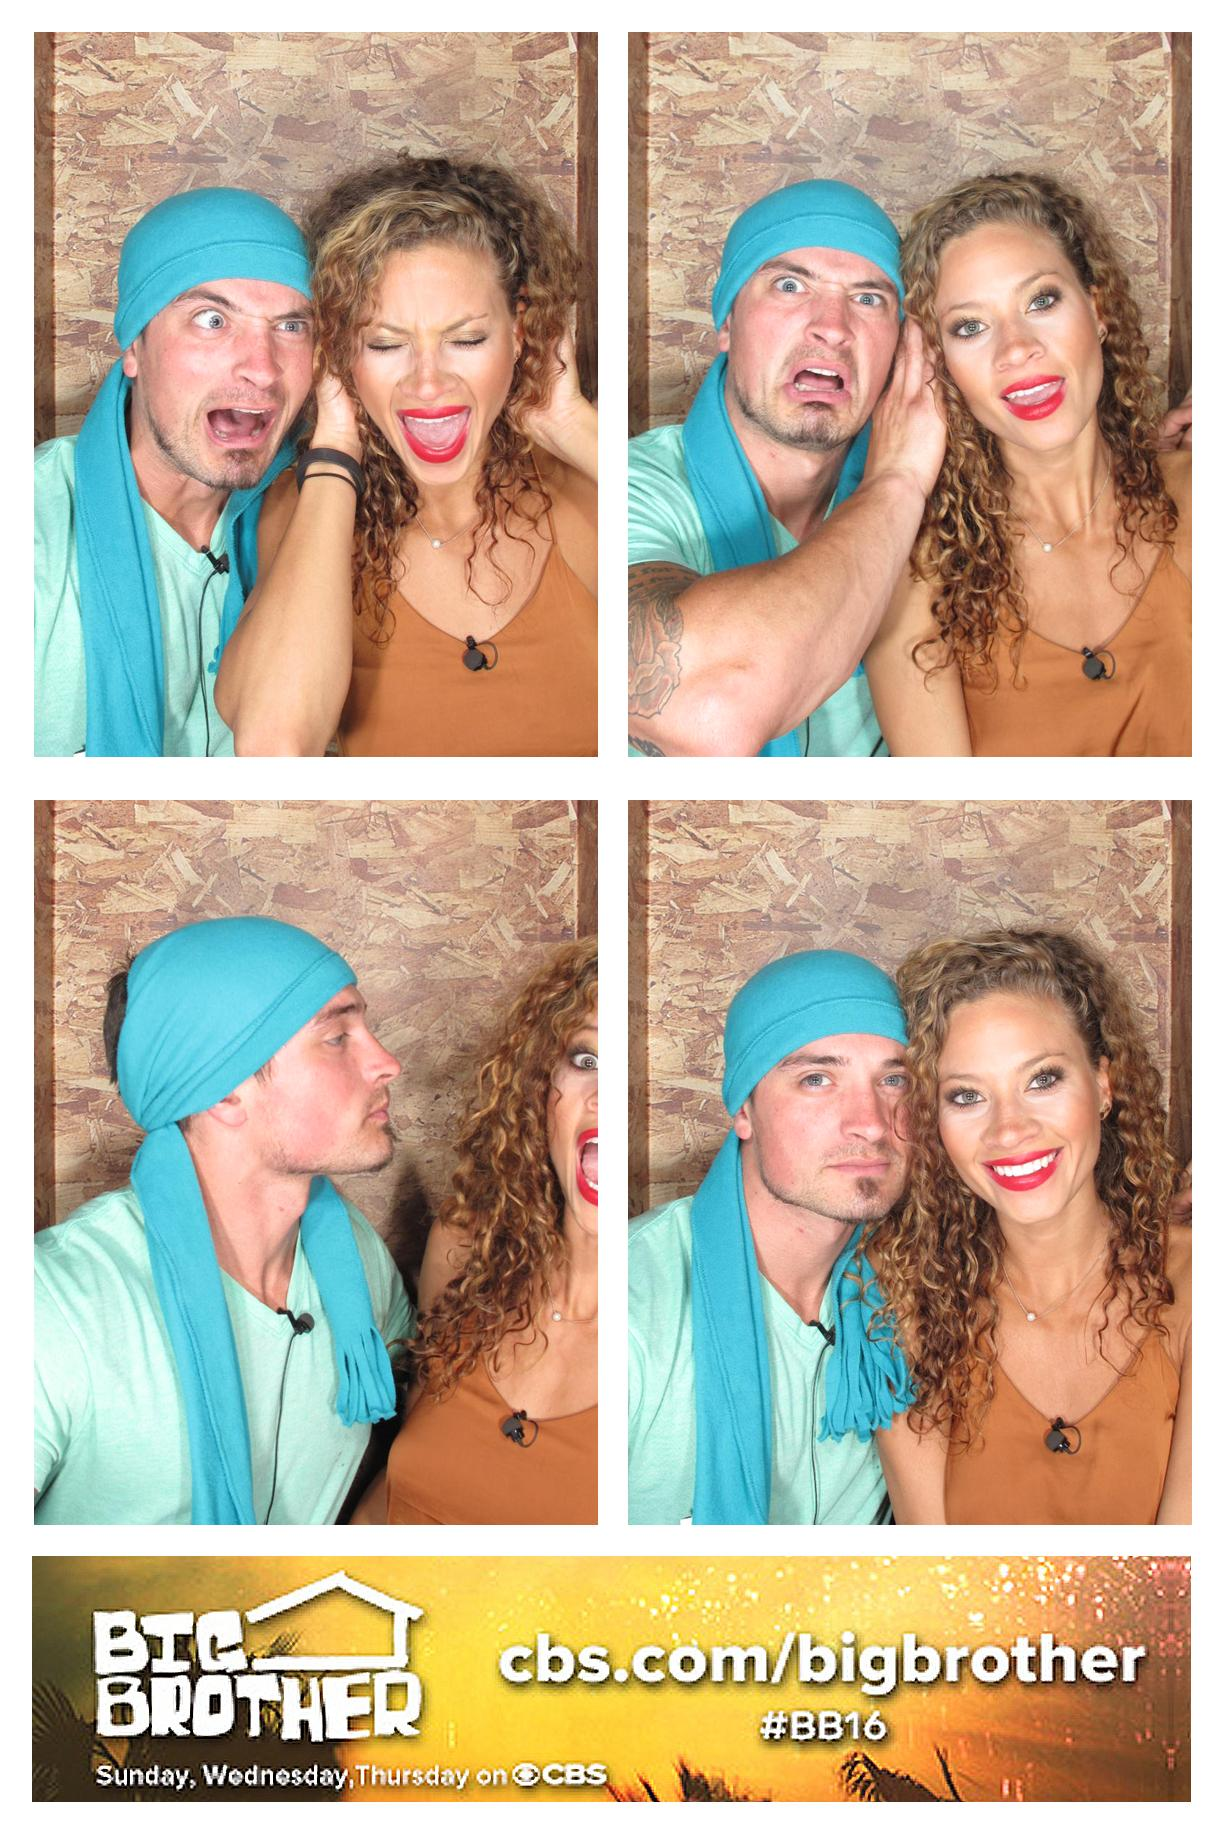 Caleb and Amber